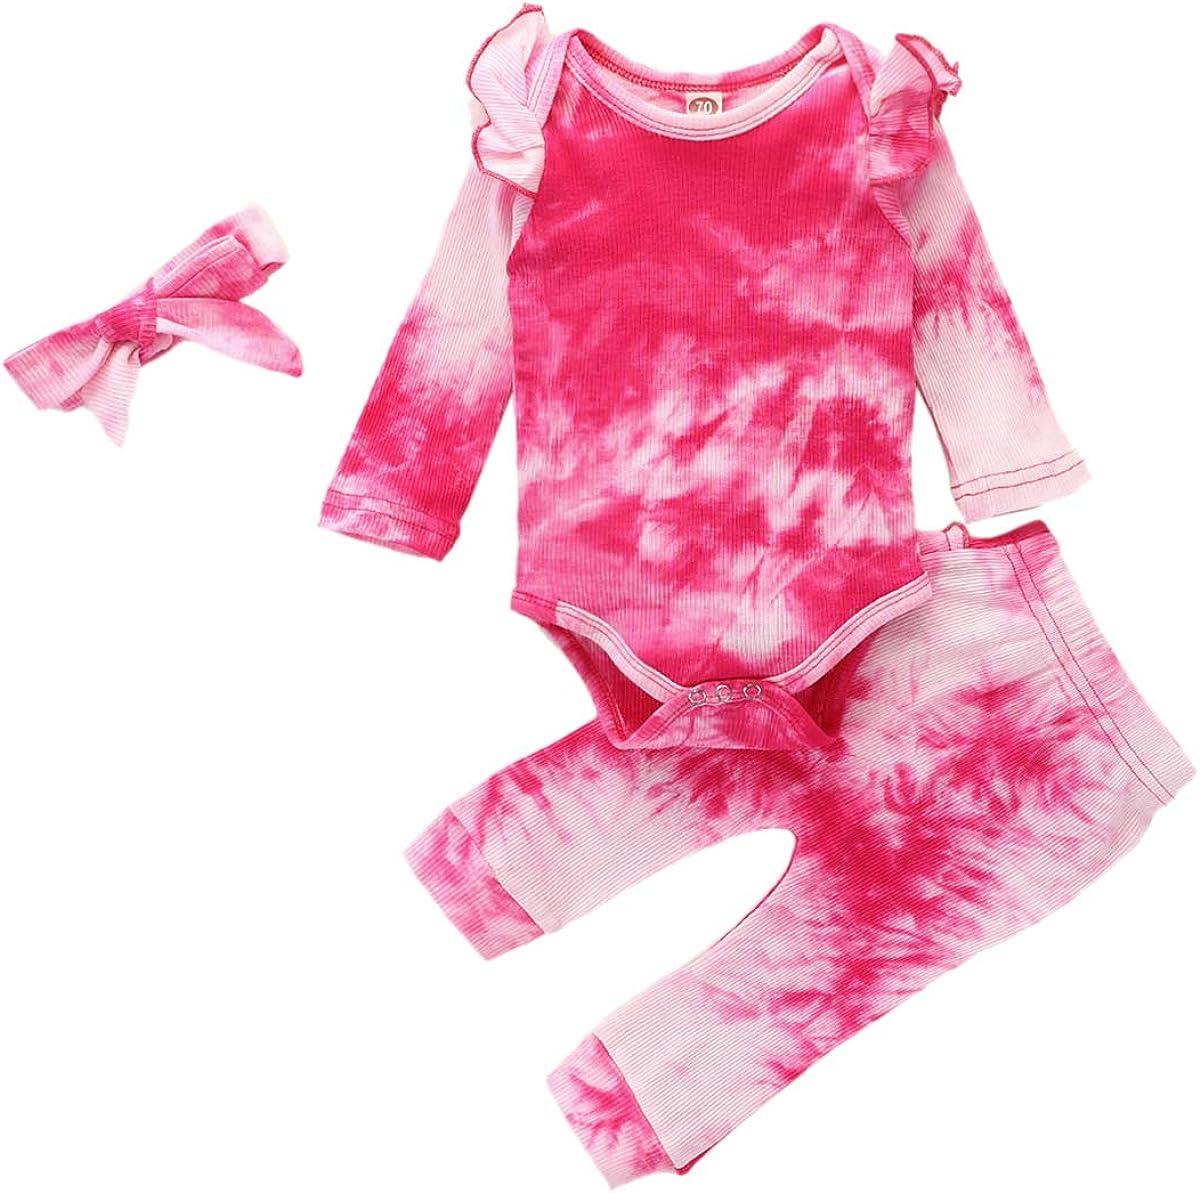 FYMNSI Baby Girls Tie Dye Outfit Knit Romper + Long Pants + Headband Pajamas Set Ribbed Ruffle Long Sleeve Sleepwear Clothes